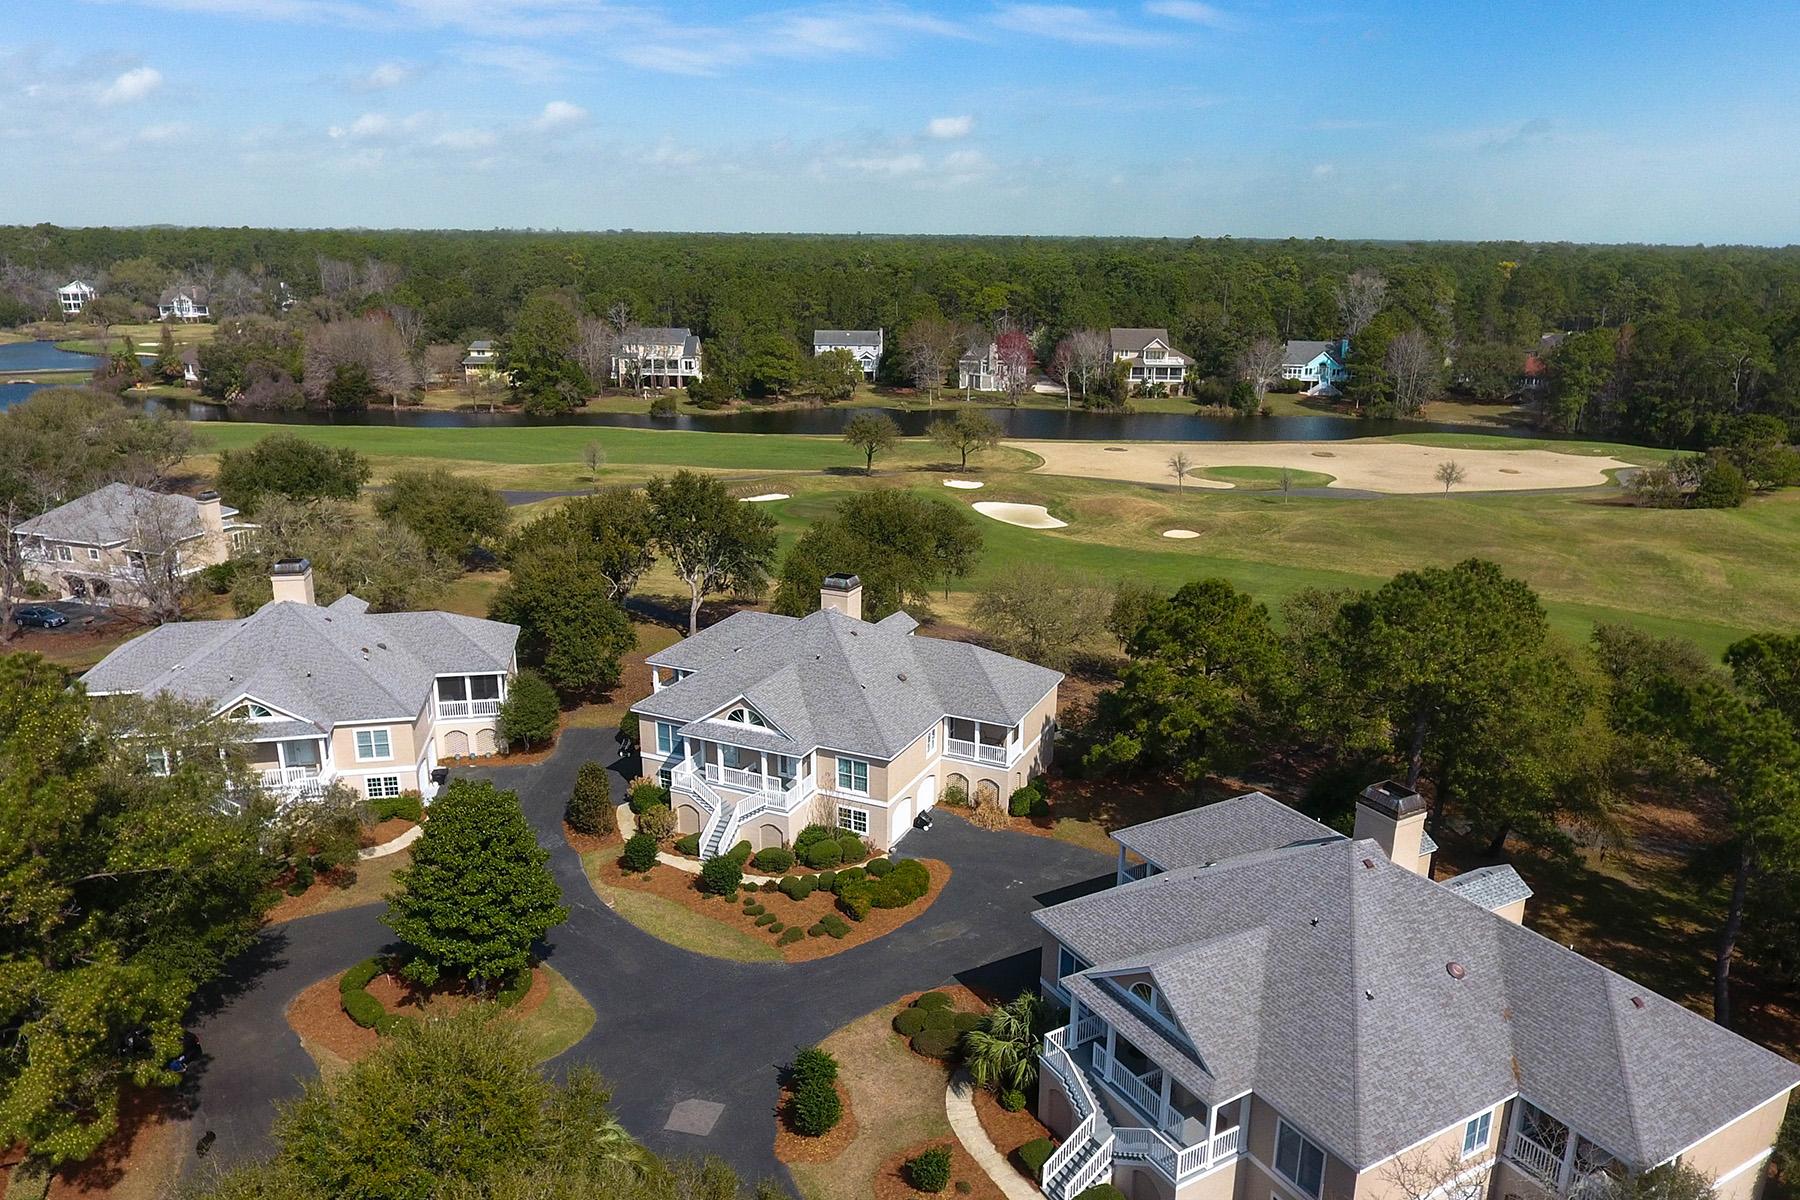 Additional photo for property listing at 104 Collins Meadow Dr., Georgetown, SC 29440 104  Collins Meadow Dr. 15 Georgetown, Carolina Del Sur 29440 Estados Unidos